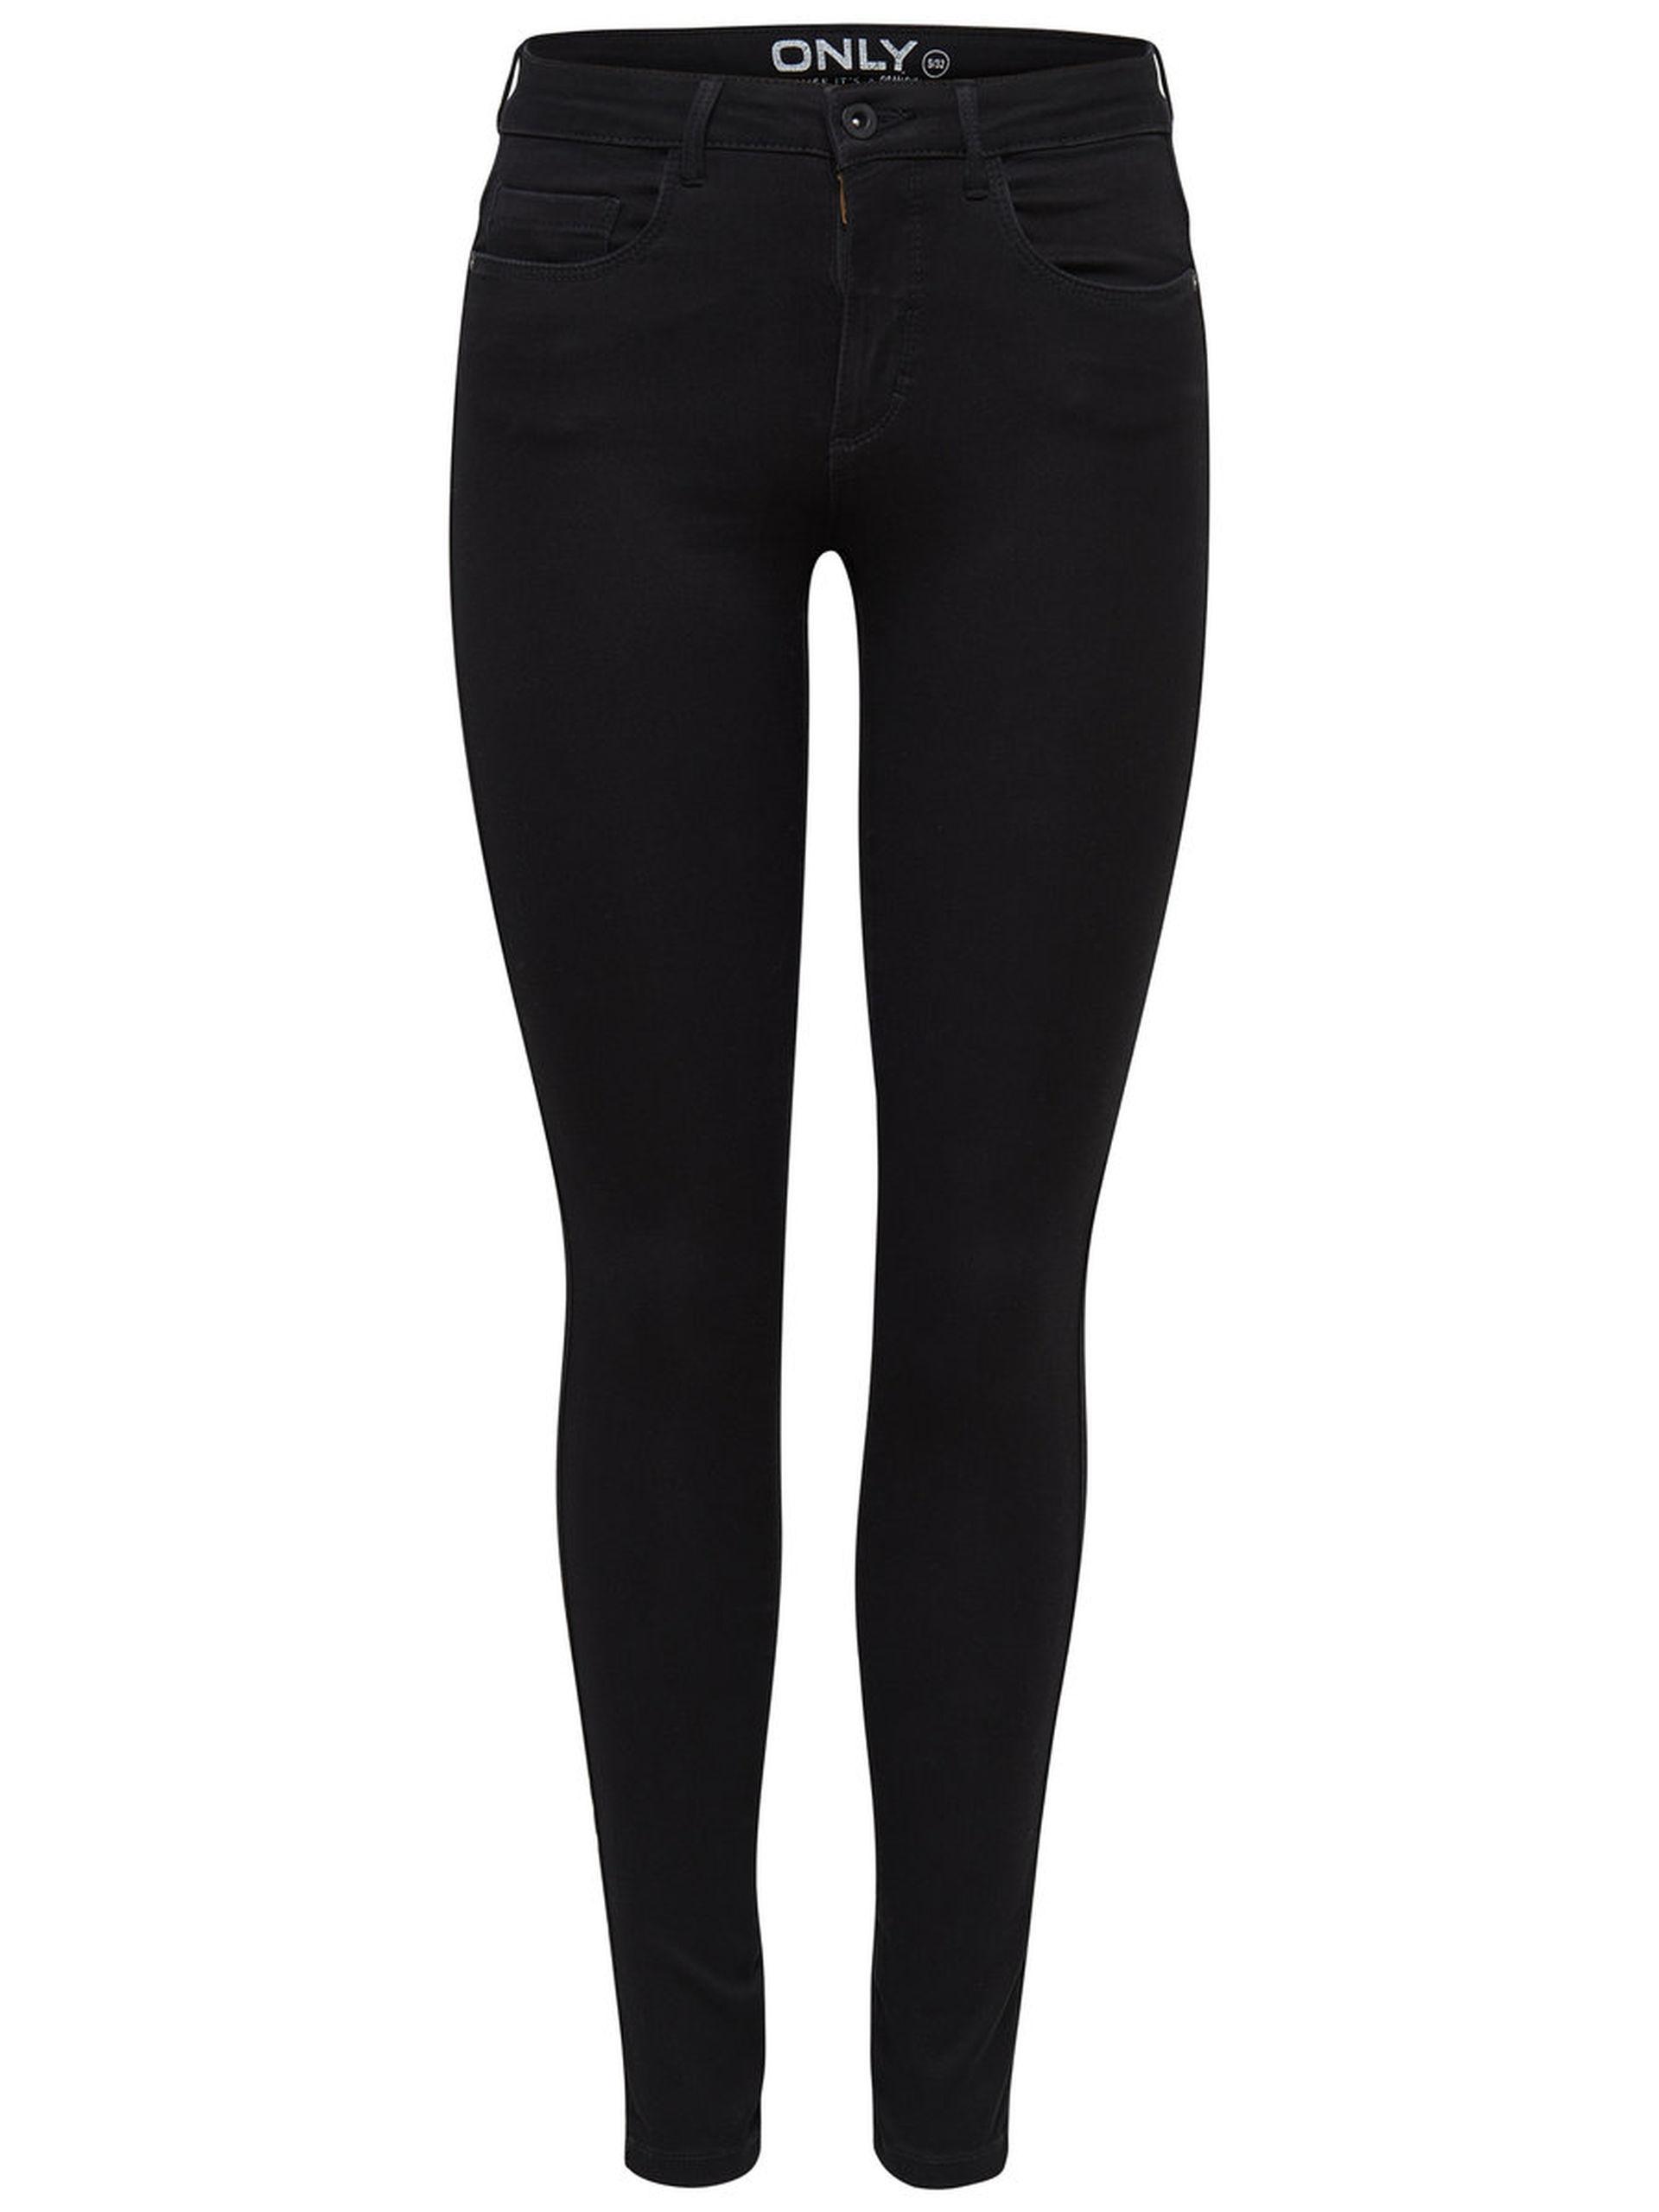 ONLY-Jeans-donna-skinny-Royal-Reg-Pim600-15092650 miniatura 2